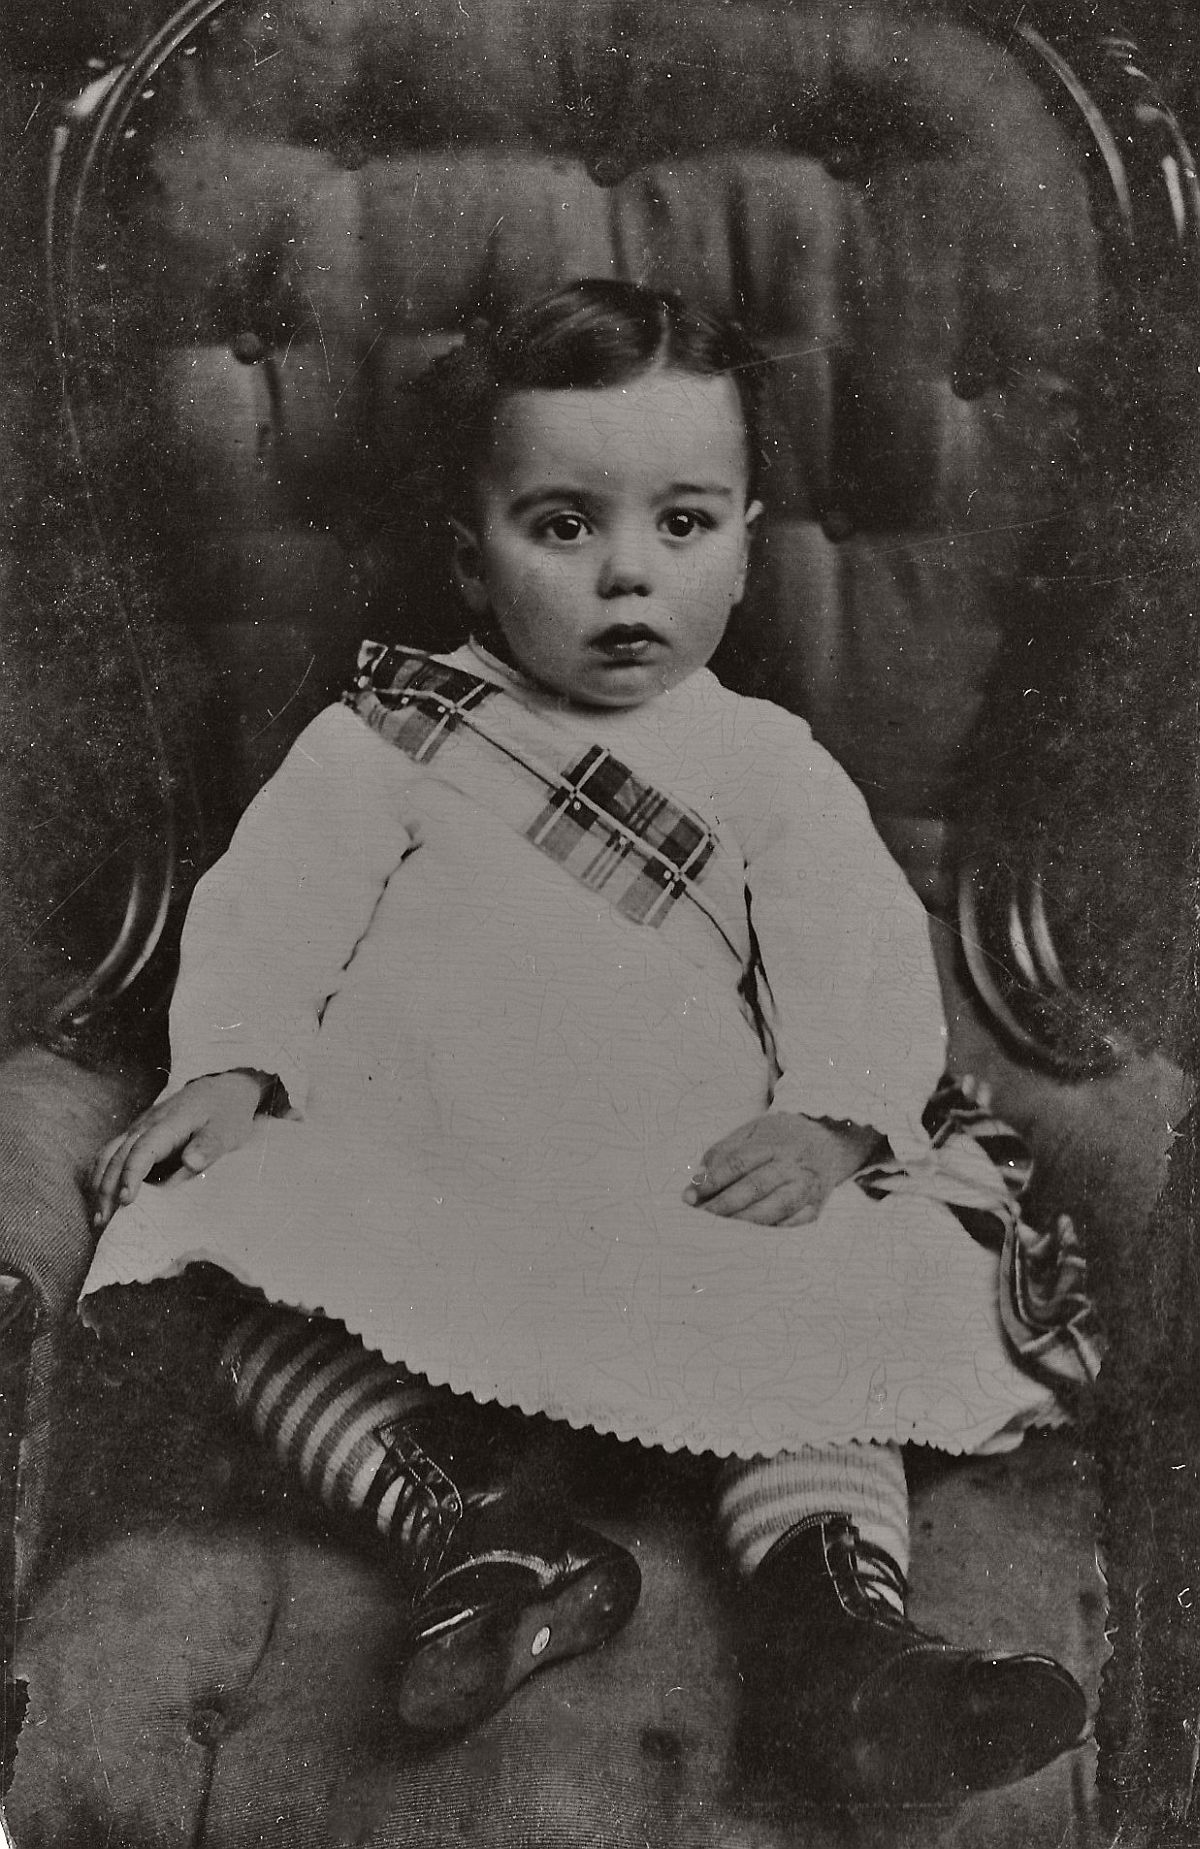 victorian-era-tintype-portraits-of-children-1870s-and-1880s-91